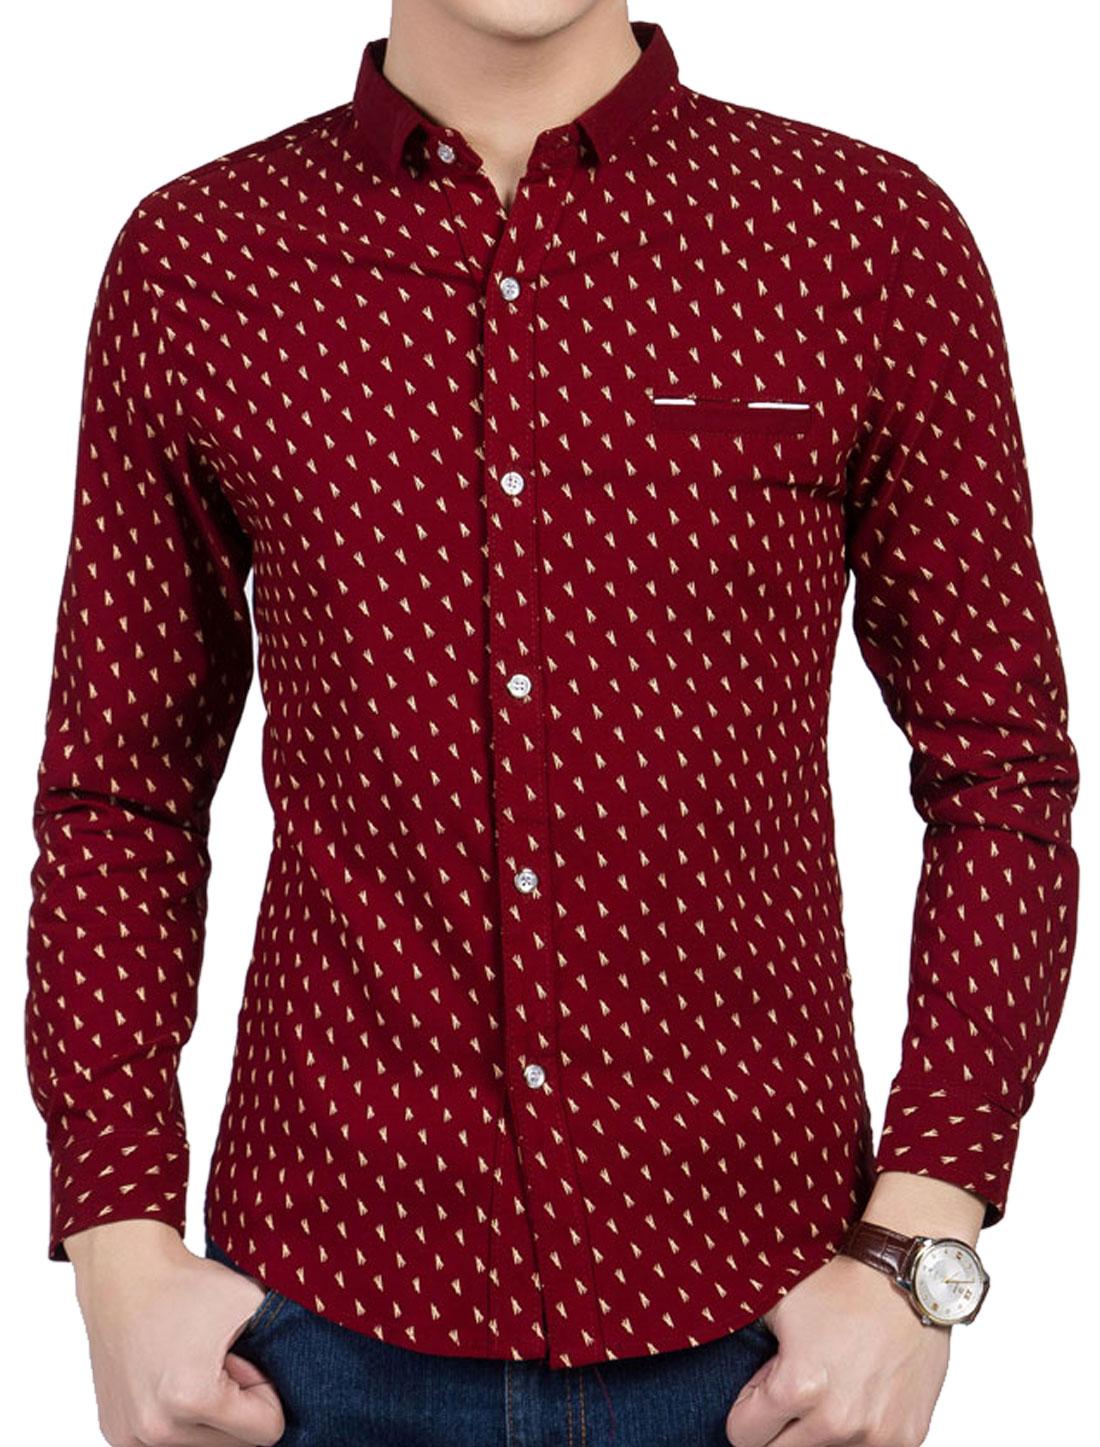 Men Button Down Point Collar Novelty Print Slim Fit Shirts Burgundy M